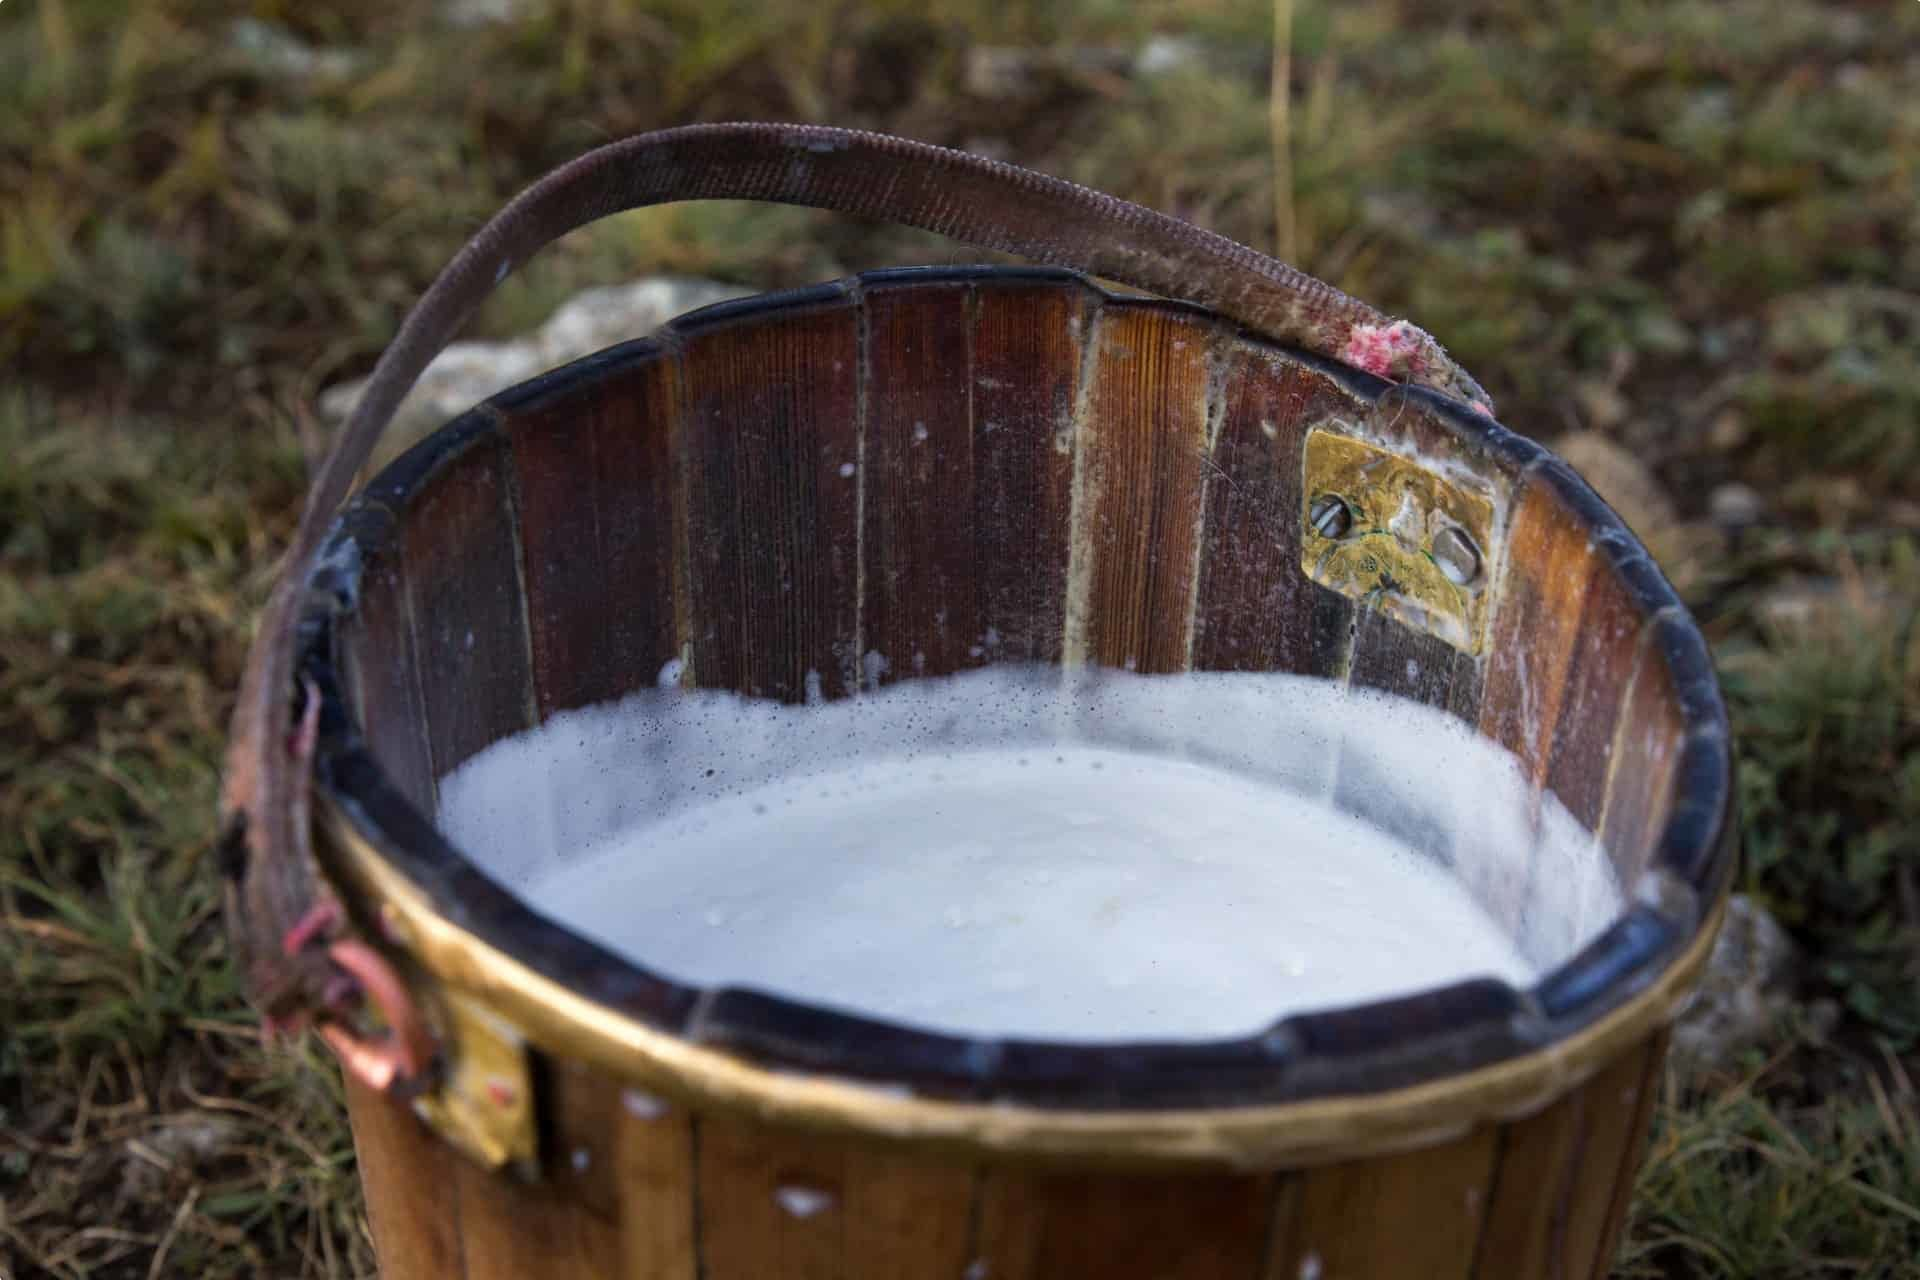 Yak milk, a staple in Mongolia